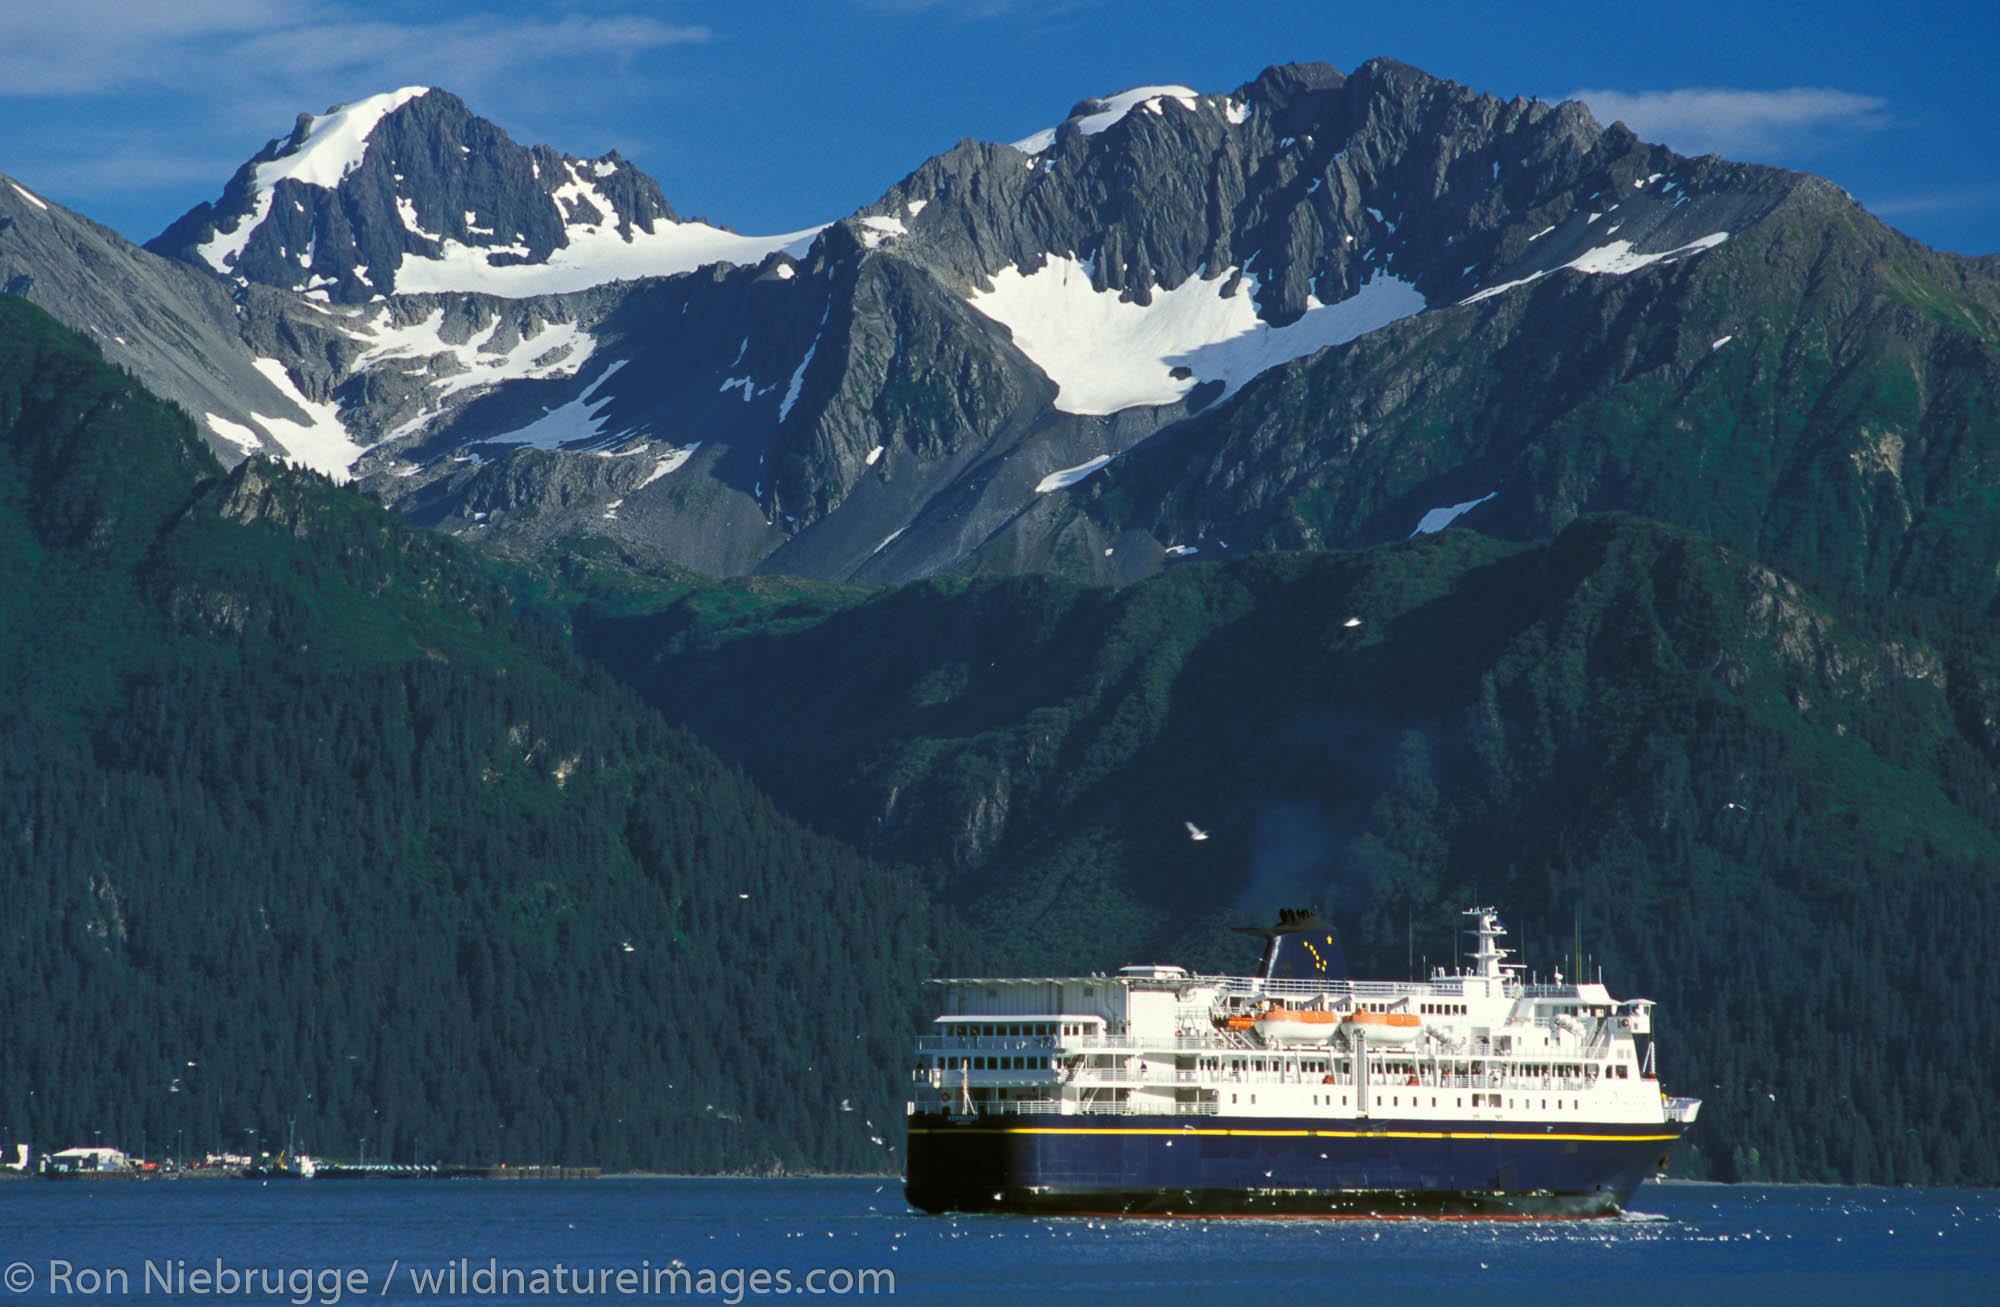 The Alaska State Ferry vessel Kennicott leaves Seward, Resurrection Bay, Alaska.